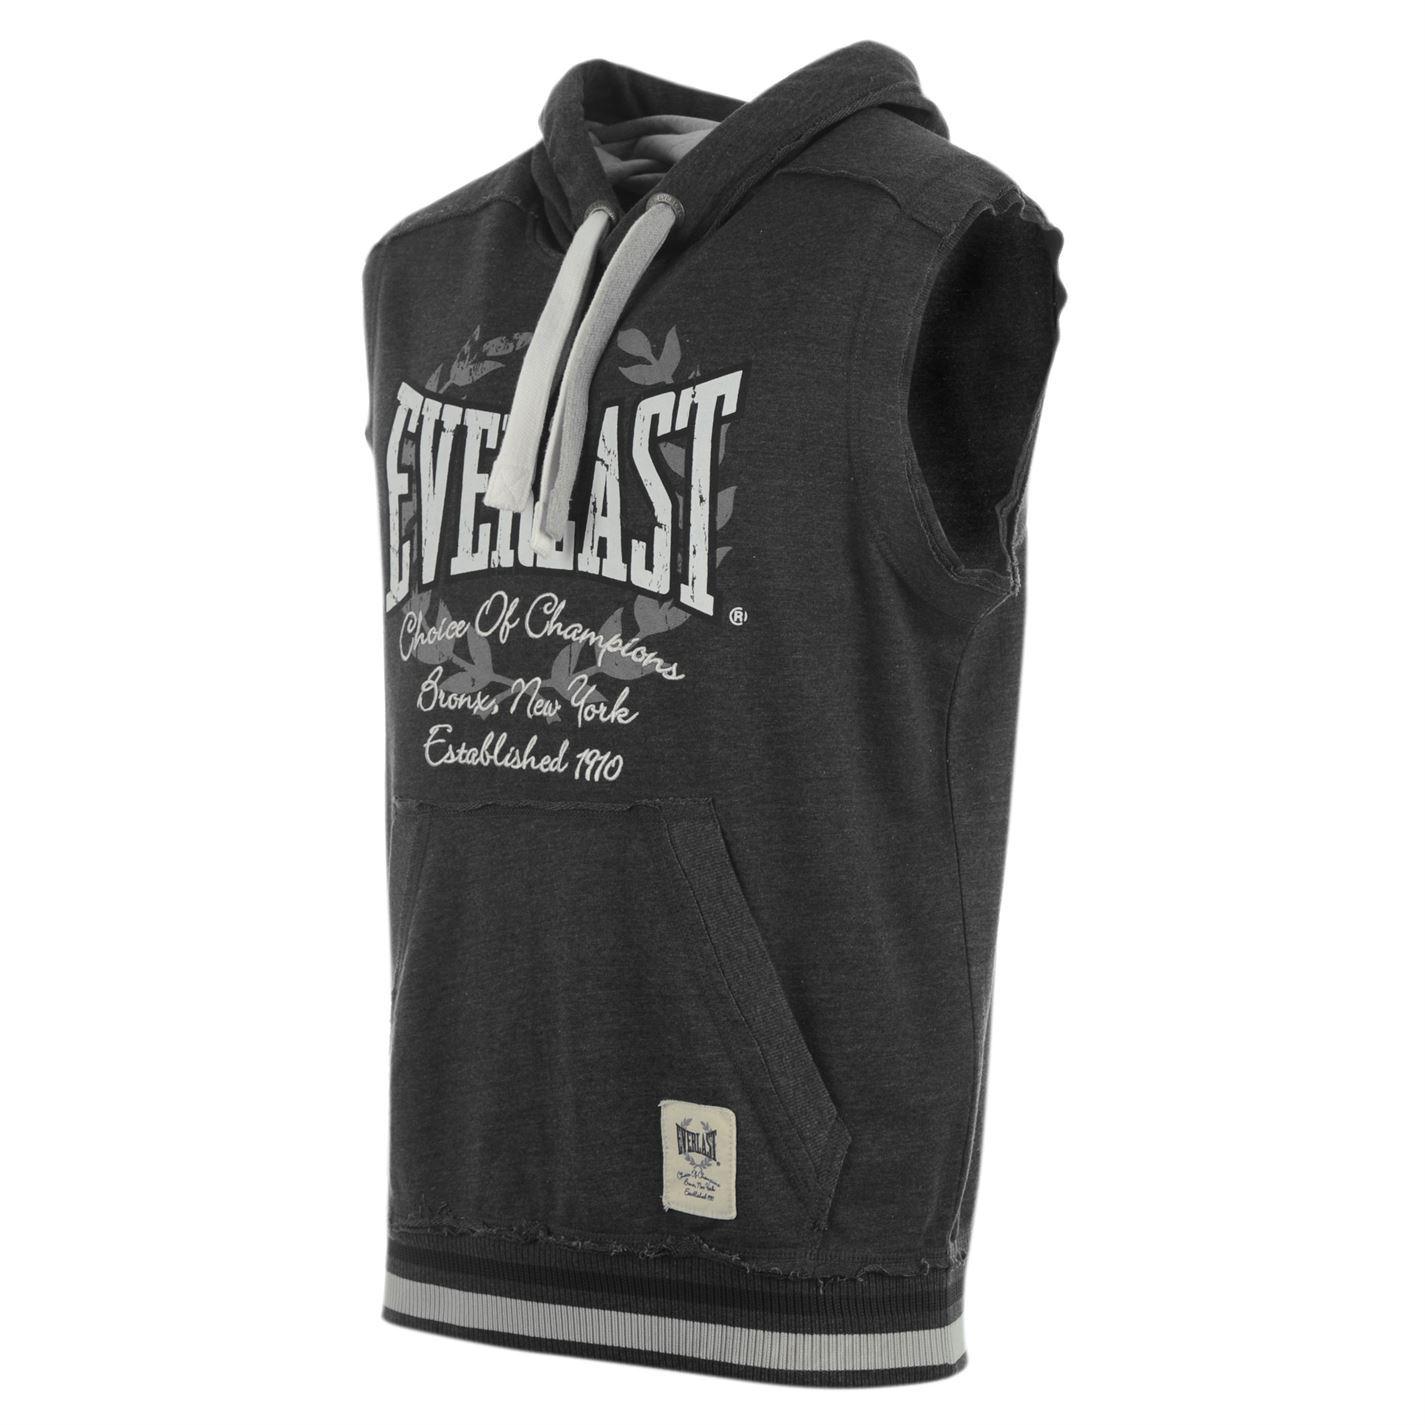 Everlast Boxing Sleeveless Vest Hoody Mens Charcoal Marl Sweatshirt Top